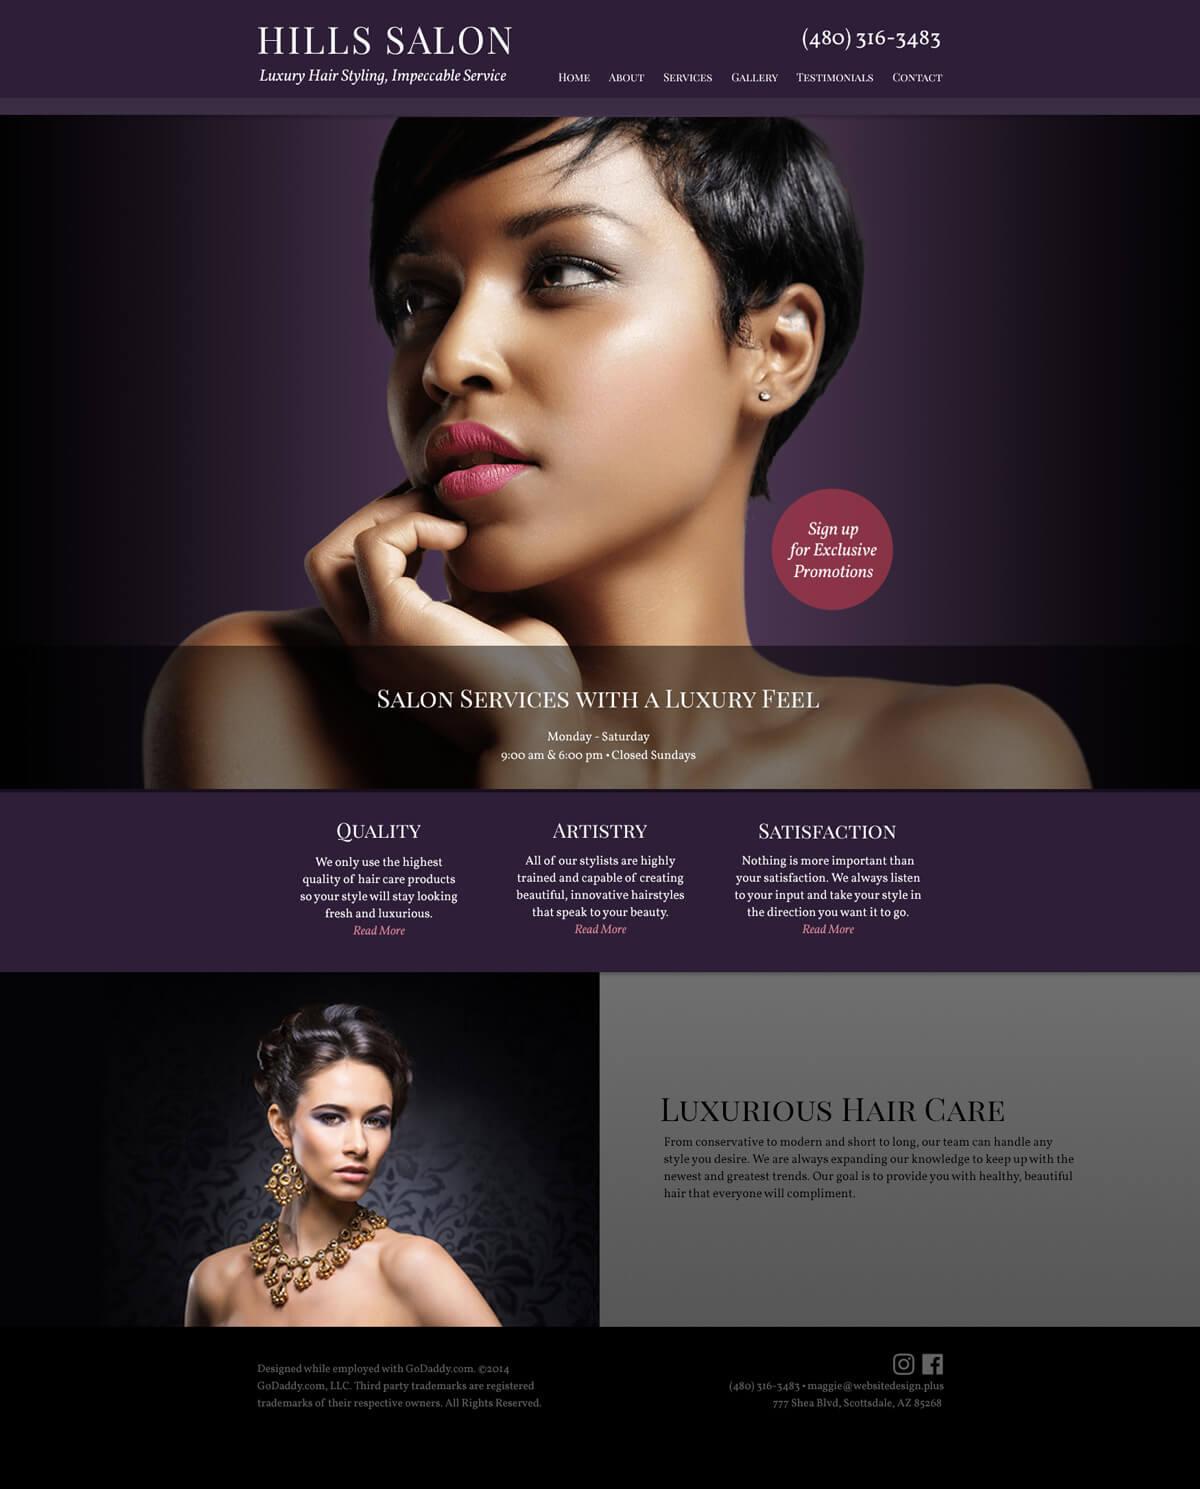 beauty salon web design mockup